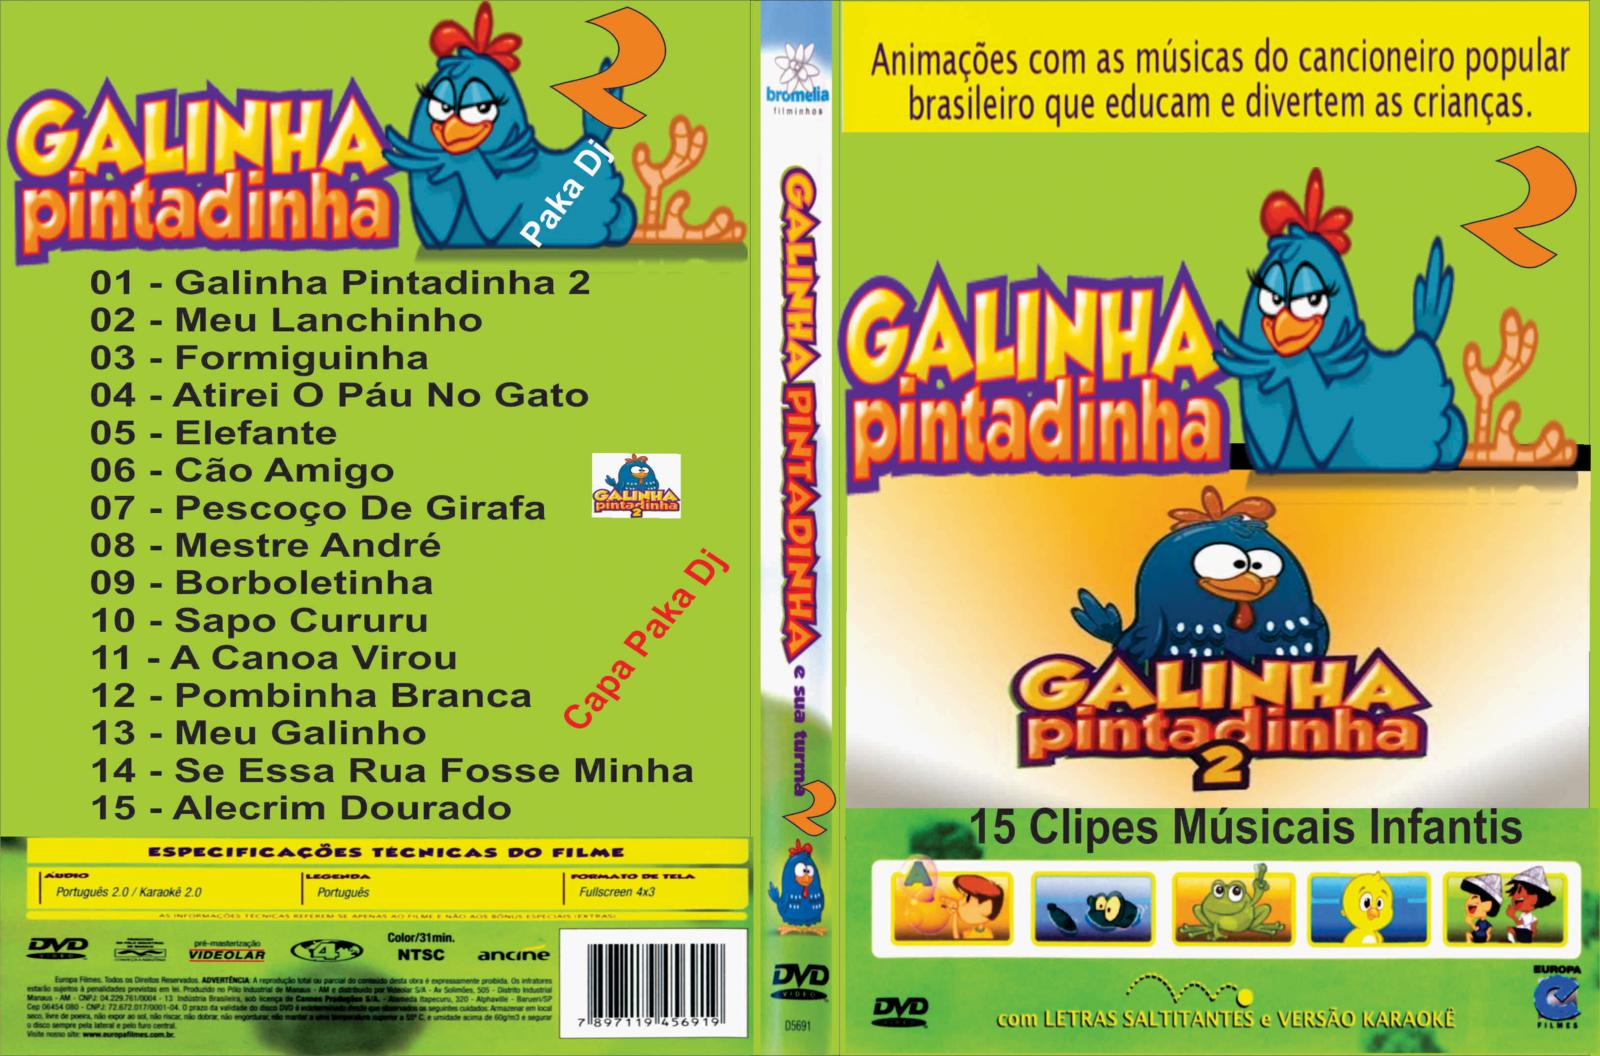 PINTADINHA GRATIS AVI GALINHA BAIXAR 3